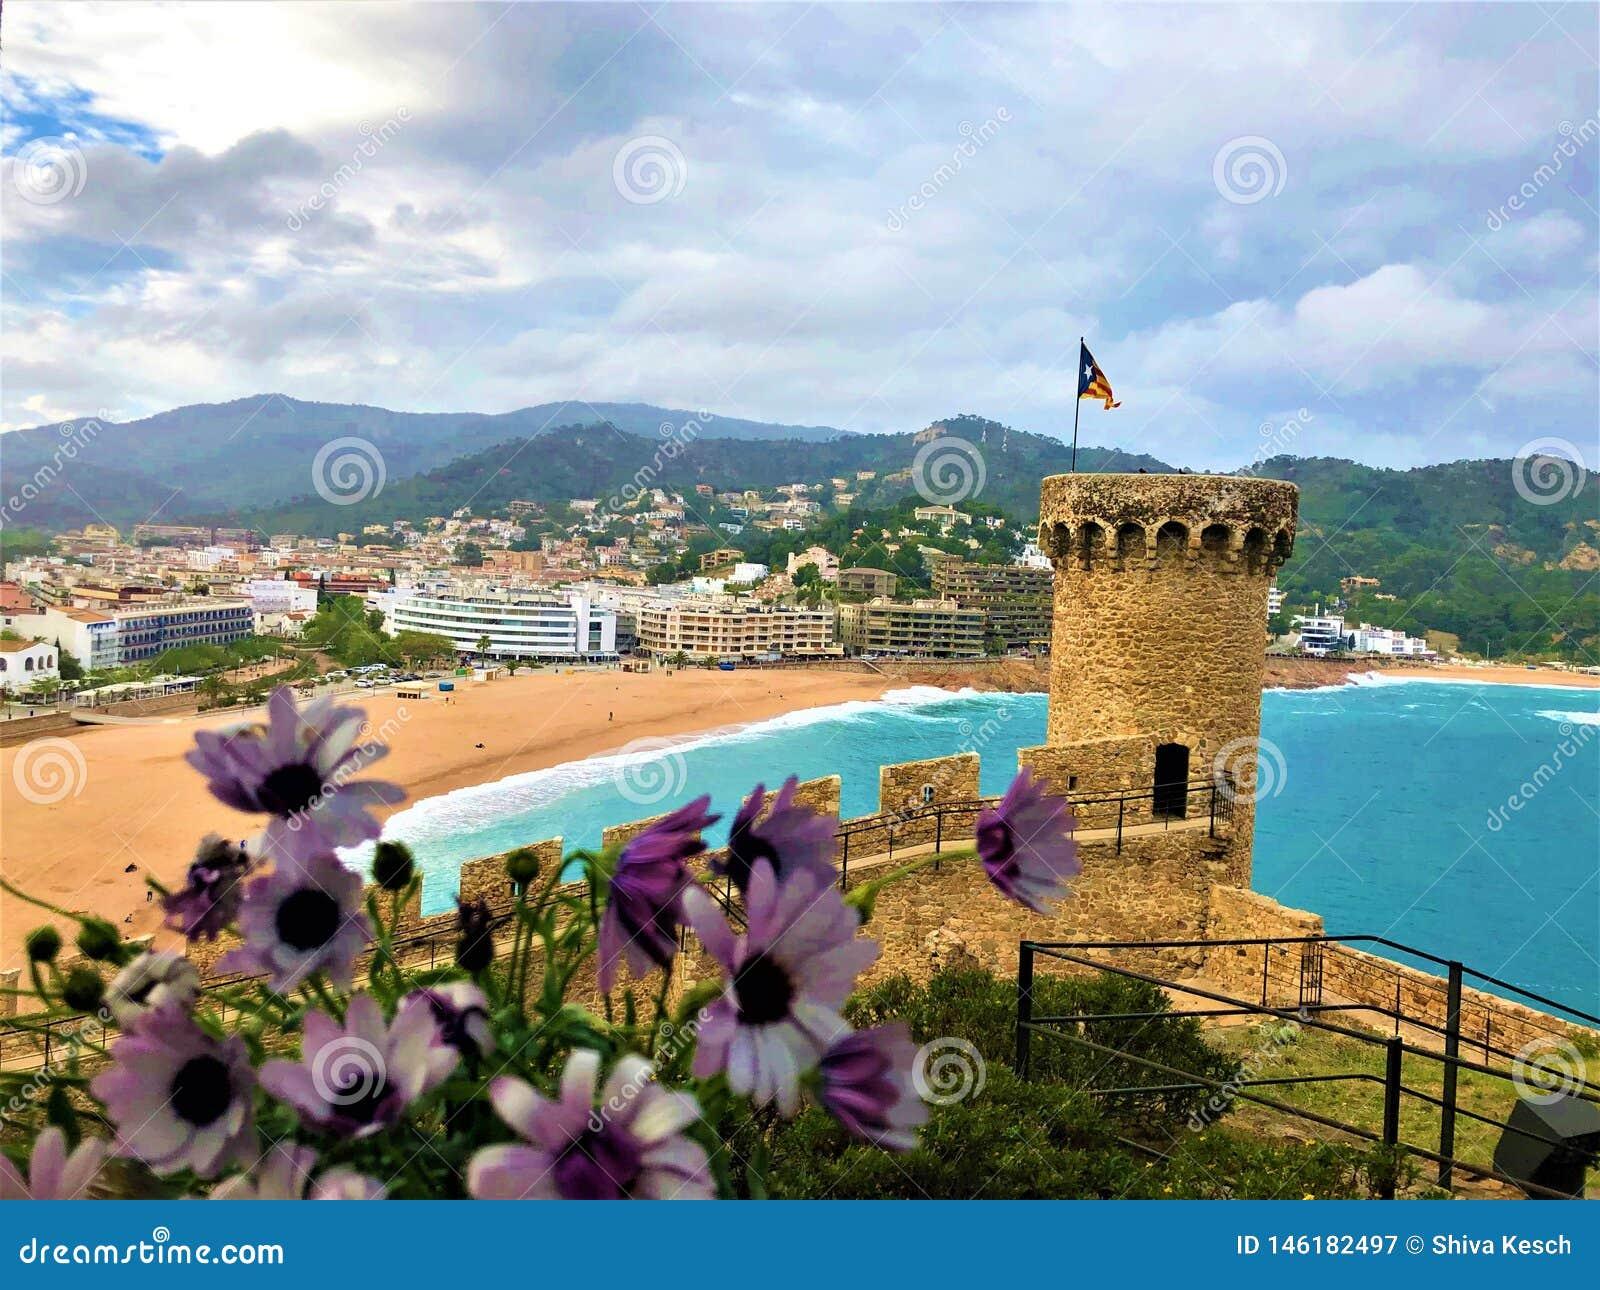 Wonderful landscape in Tossa de Mar, Spain. Medieval tower, beach, sea and flowers